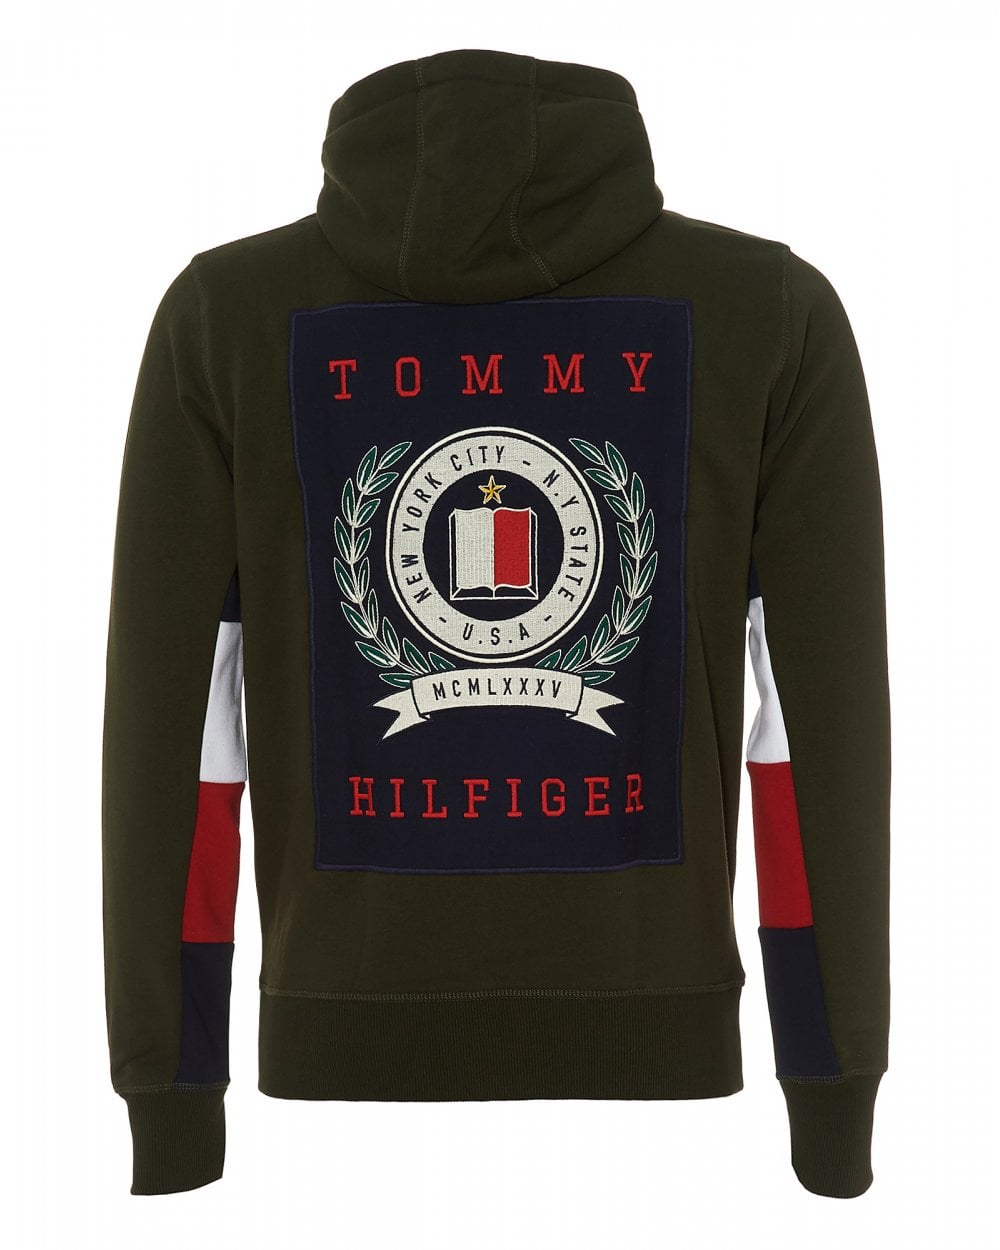 8a9bdb527bc73 Tommy Hilfiger Mens Crest Back Hoodie